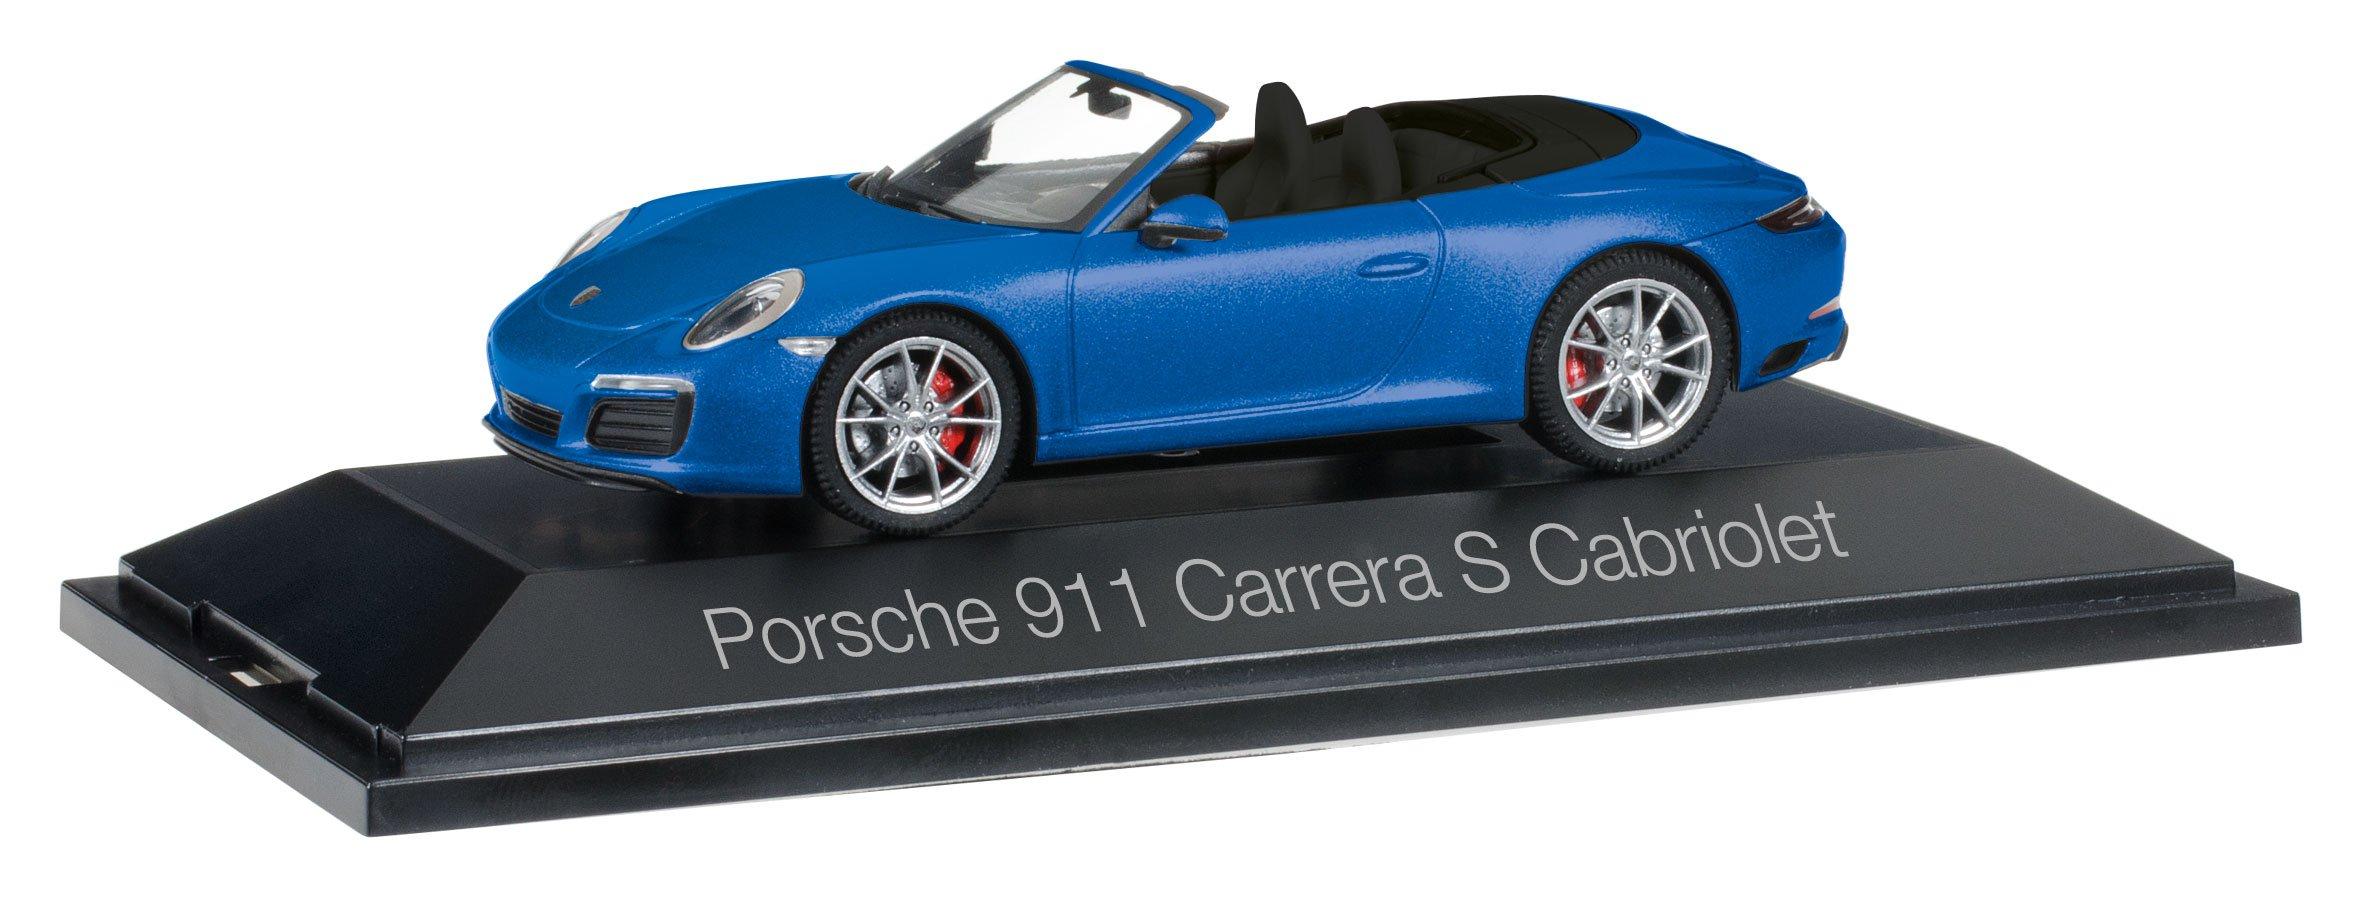 HERPA 70997 ''Porsche 911 Carrera S Cabriolet 991 Ii Model Set, Metallic Sapphire Blue